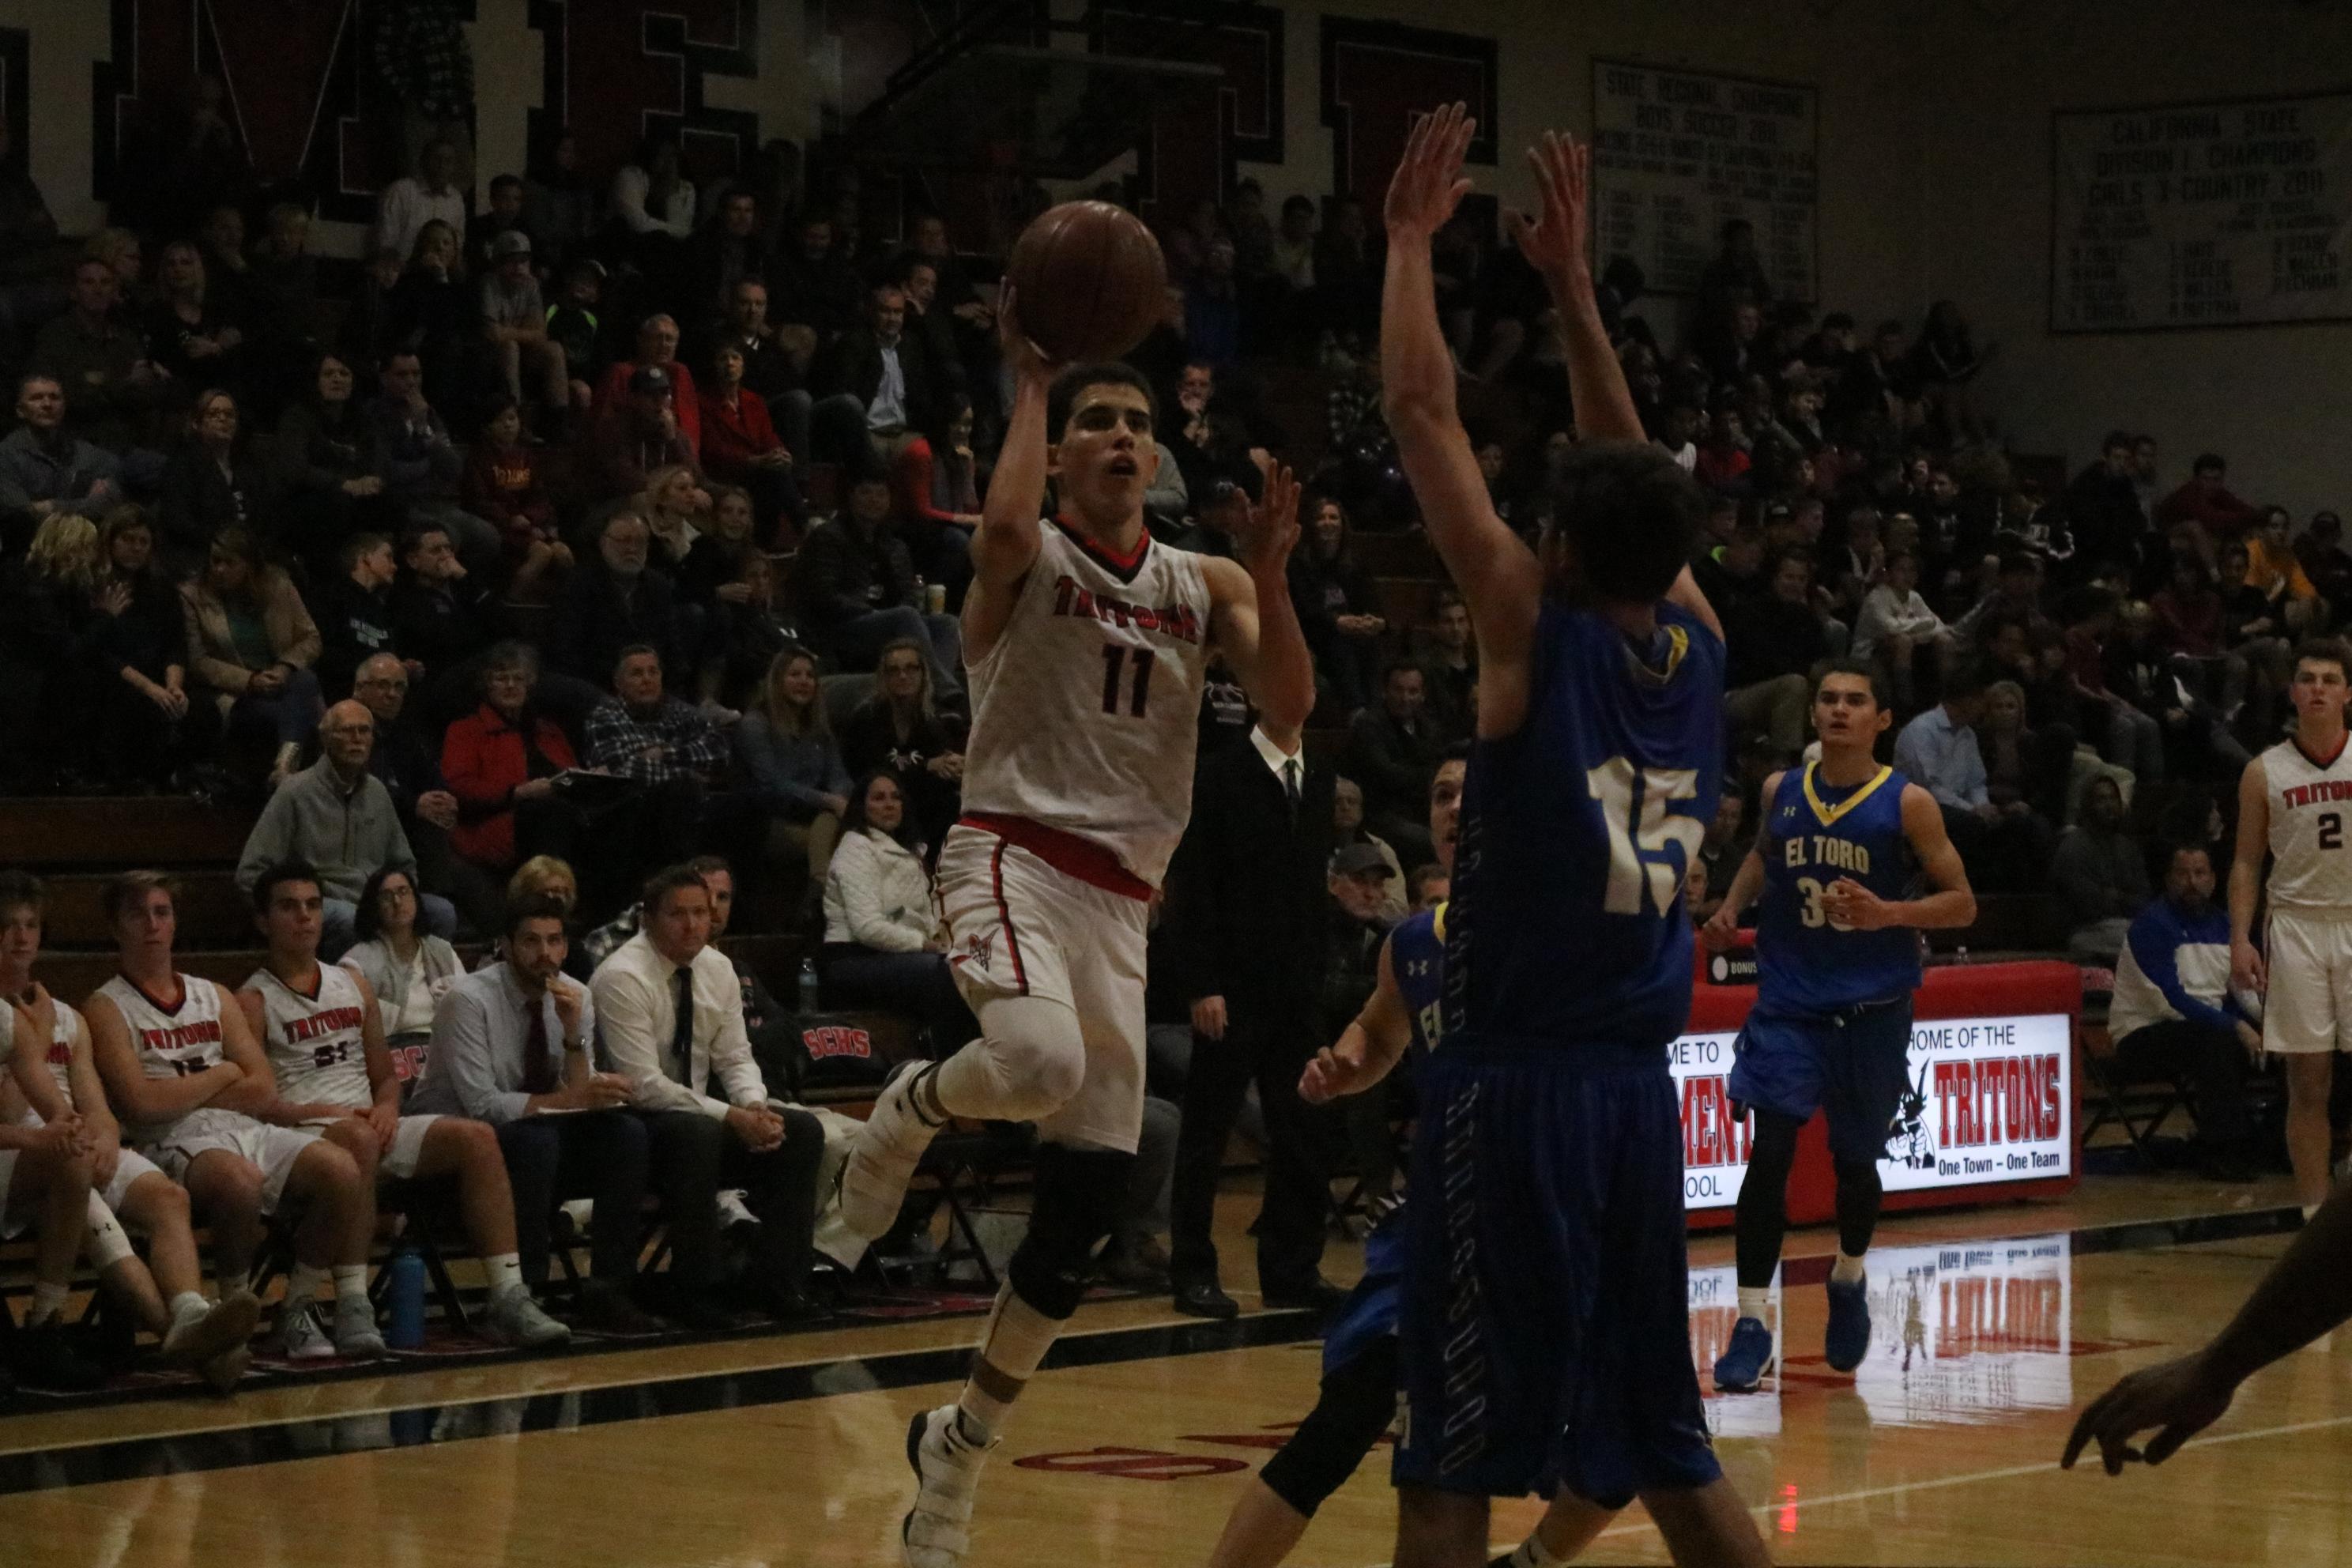 Jacob Nemeth rises up for a lay-up. Photo: Zach Cavanagh